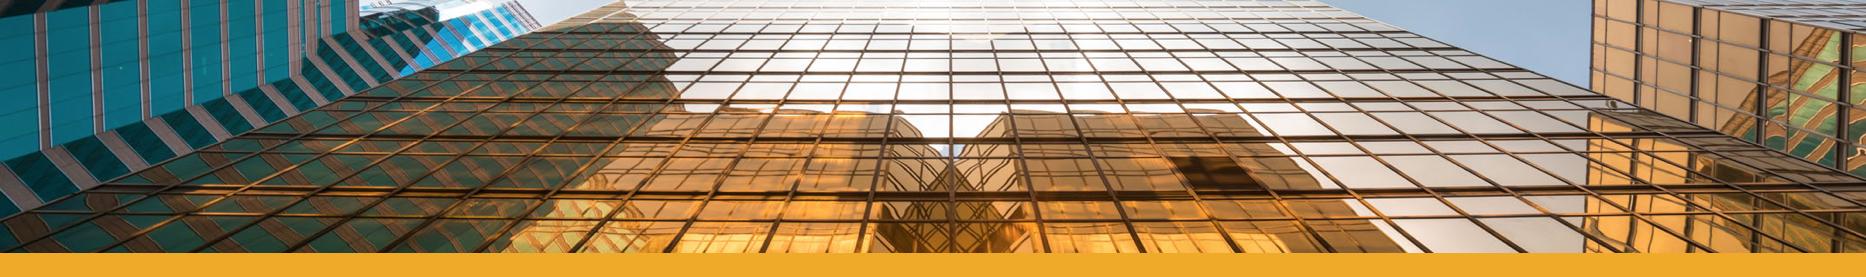 SAP Business Scenario Recommendations for SAP S/4HANA